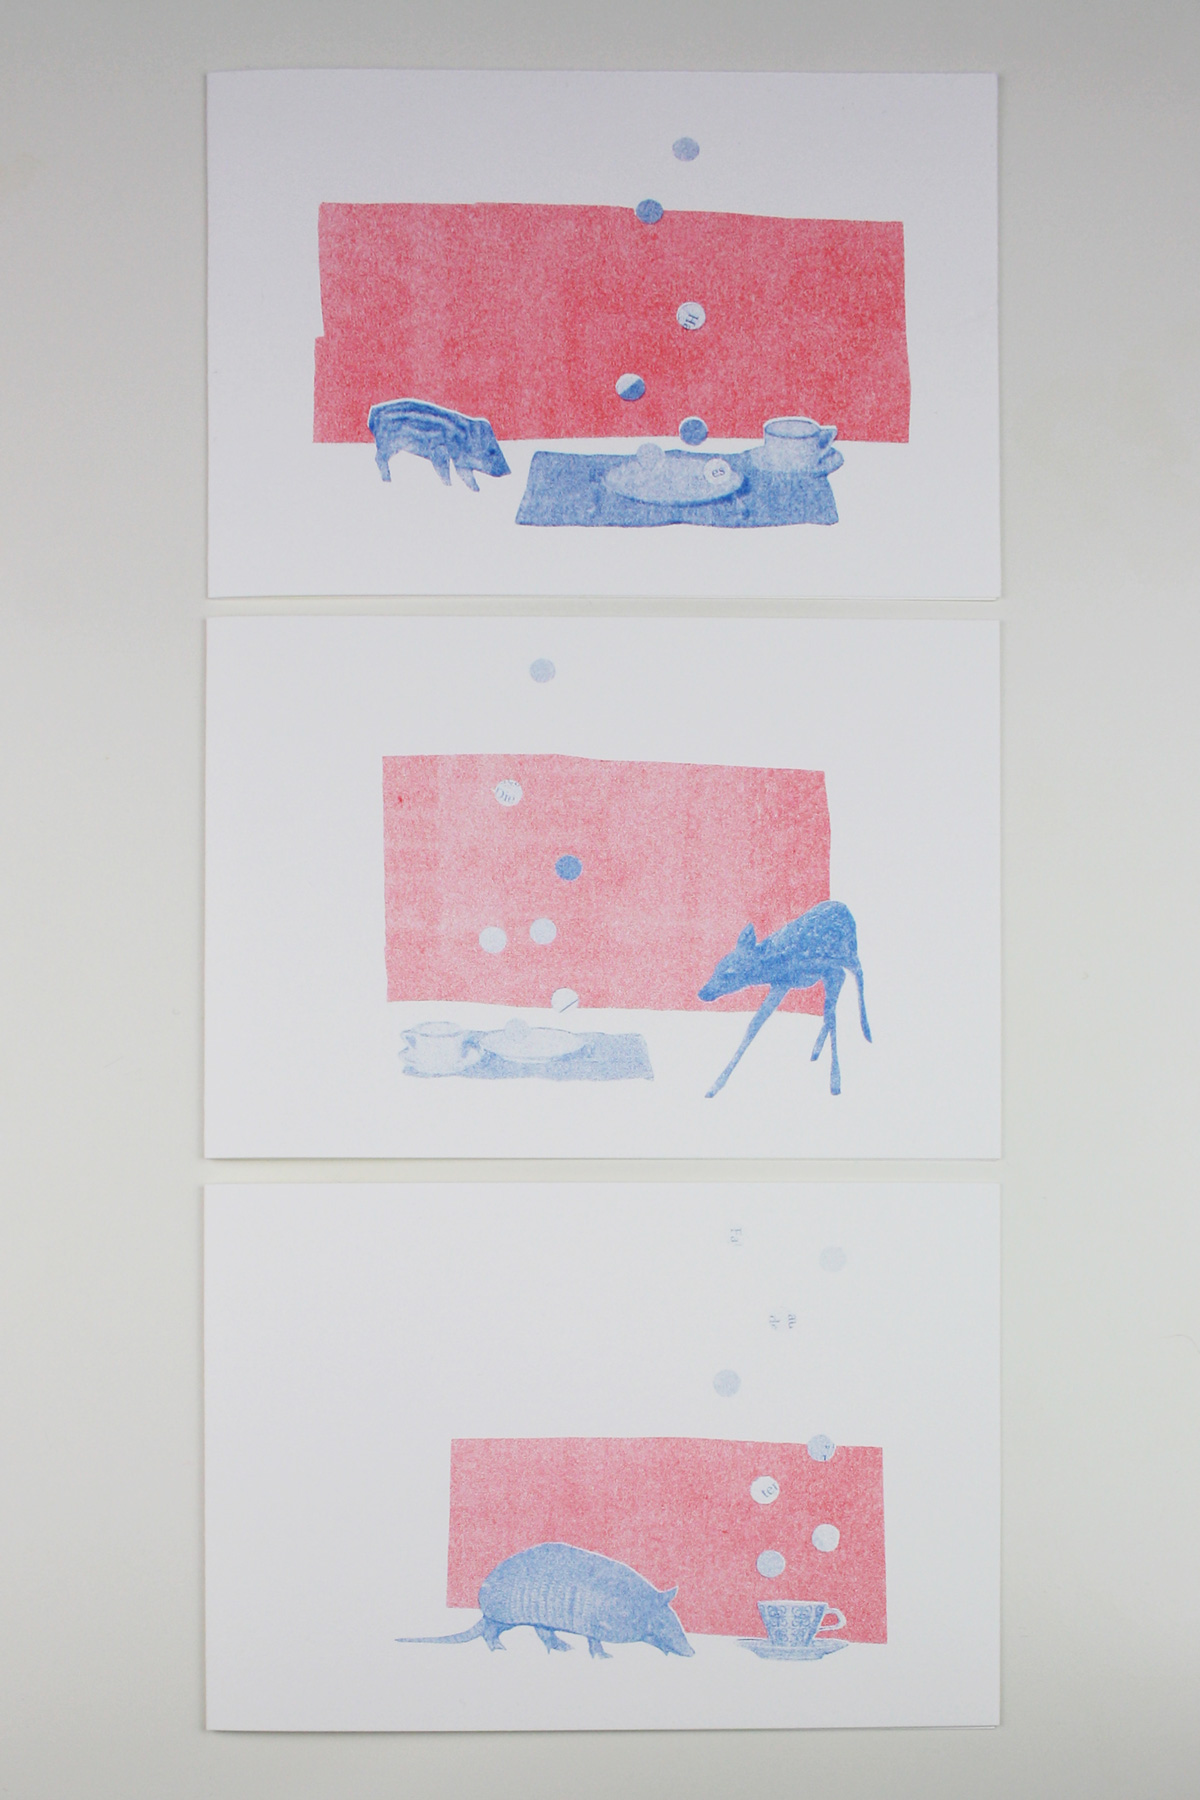 postkarte_collage_illustration_kathleen_gust_riso_druck_valentinstag_handlettering2